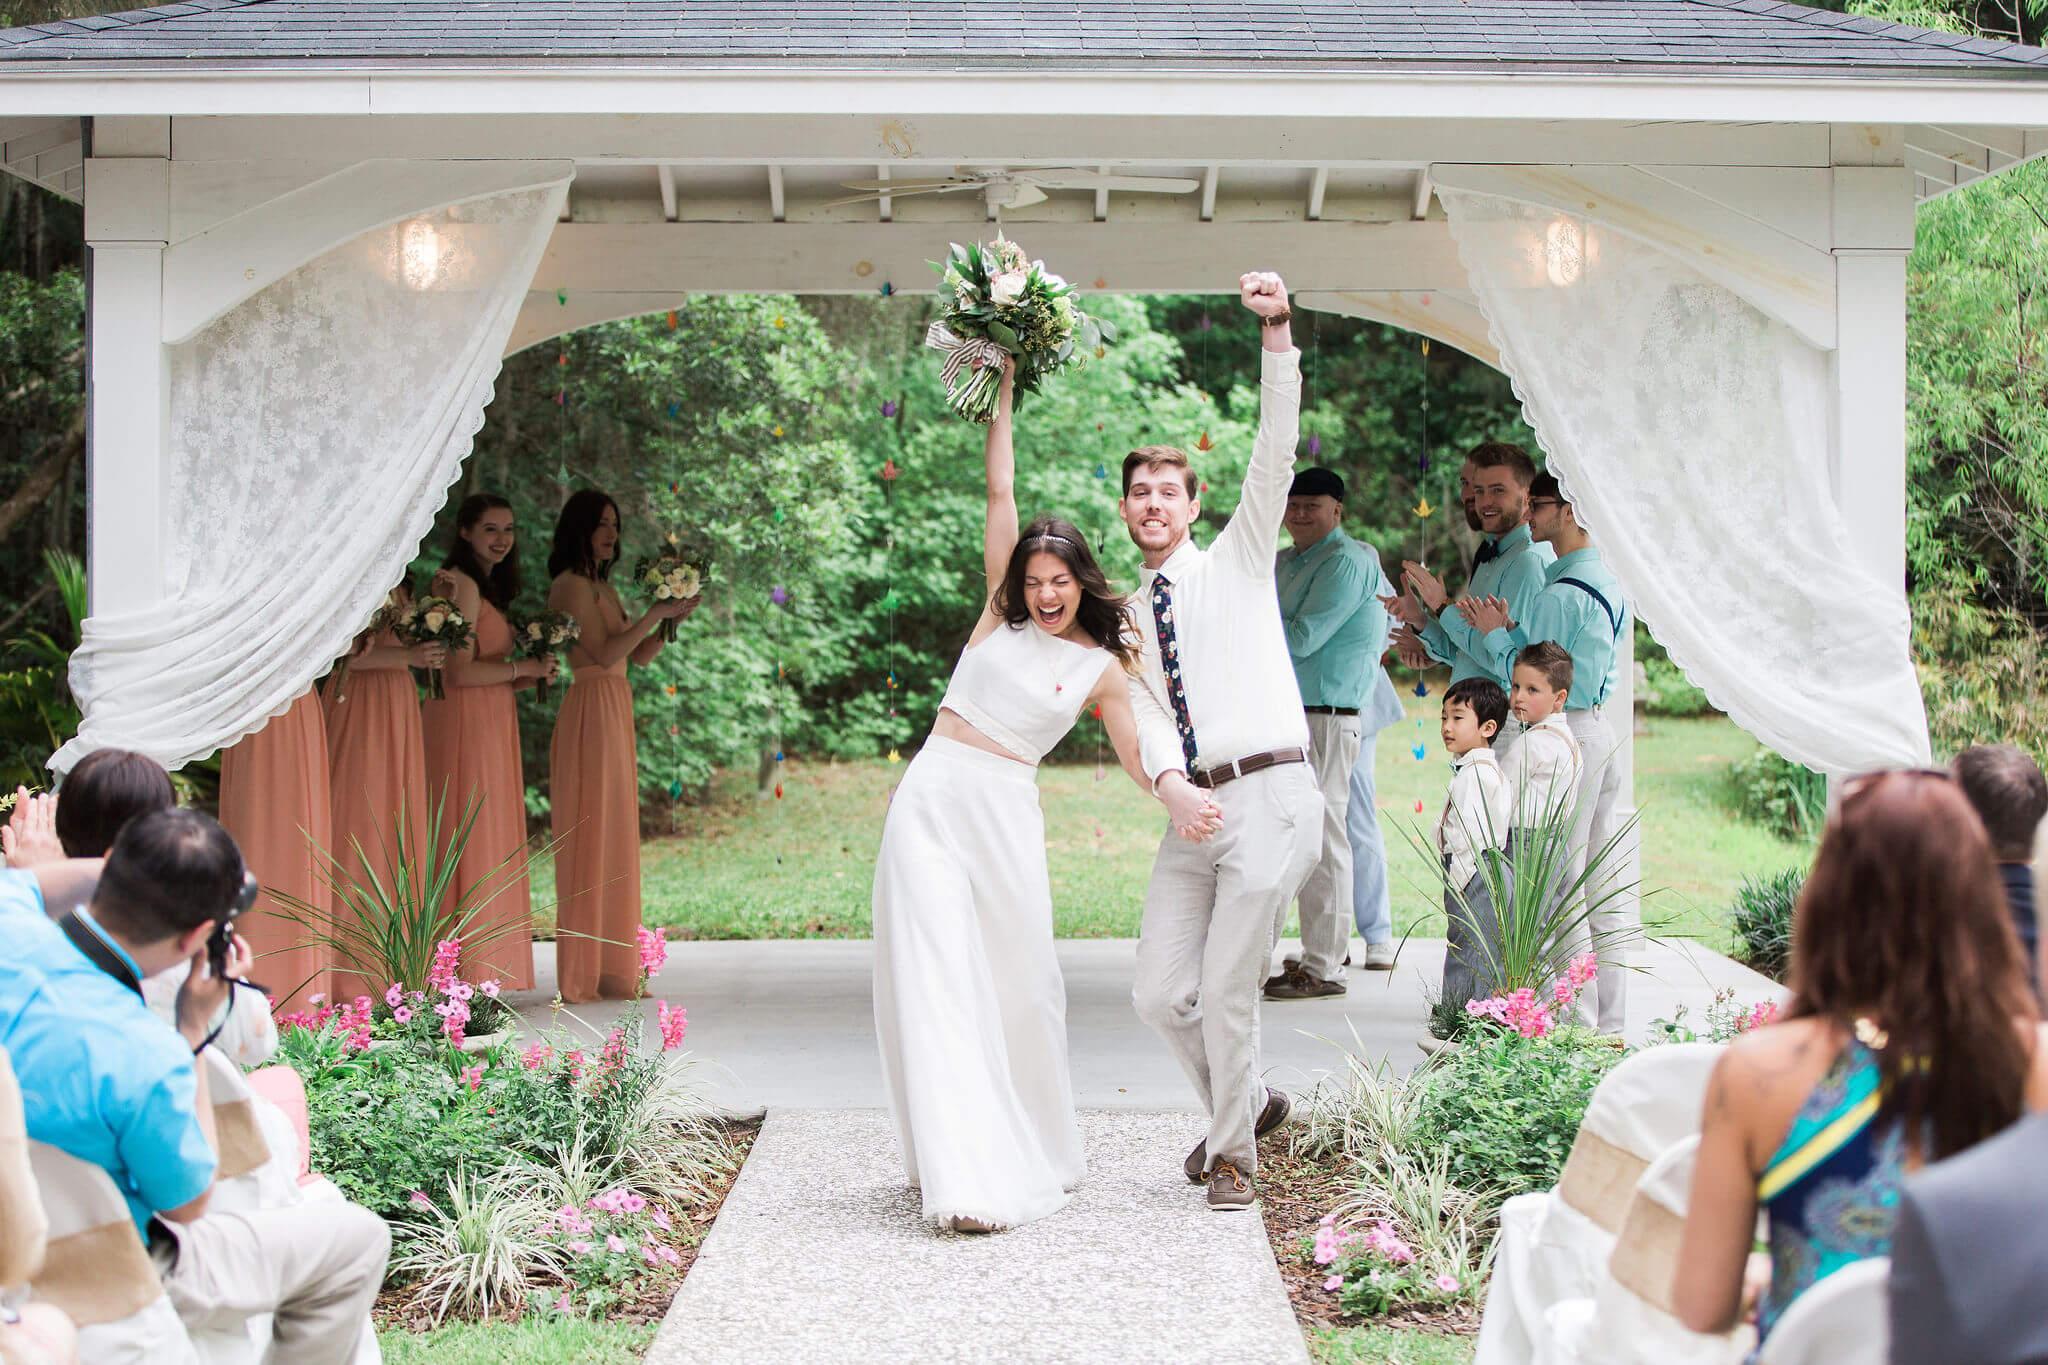 apt-b-photography-savannah-wedding-photographer-savannah-wedding-savannah-elopement-intimate-wedding-photographer-78.JPG